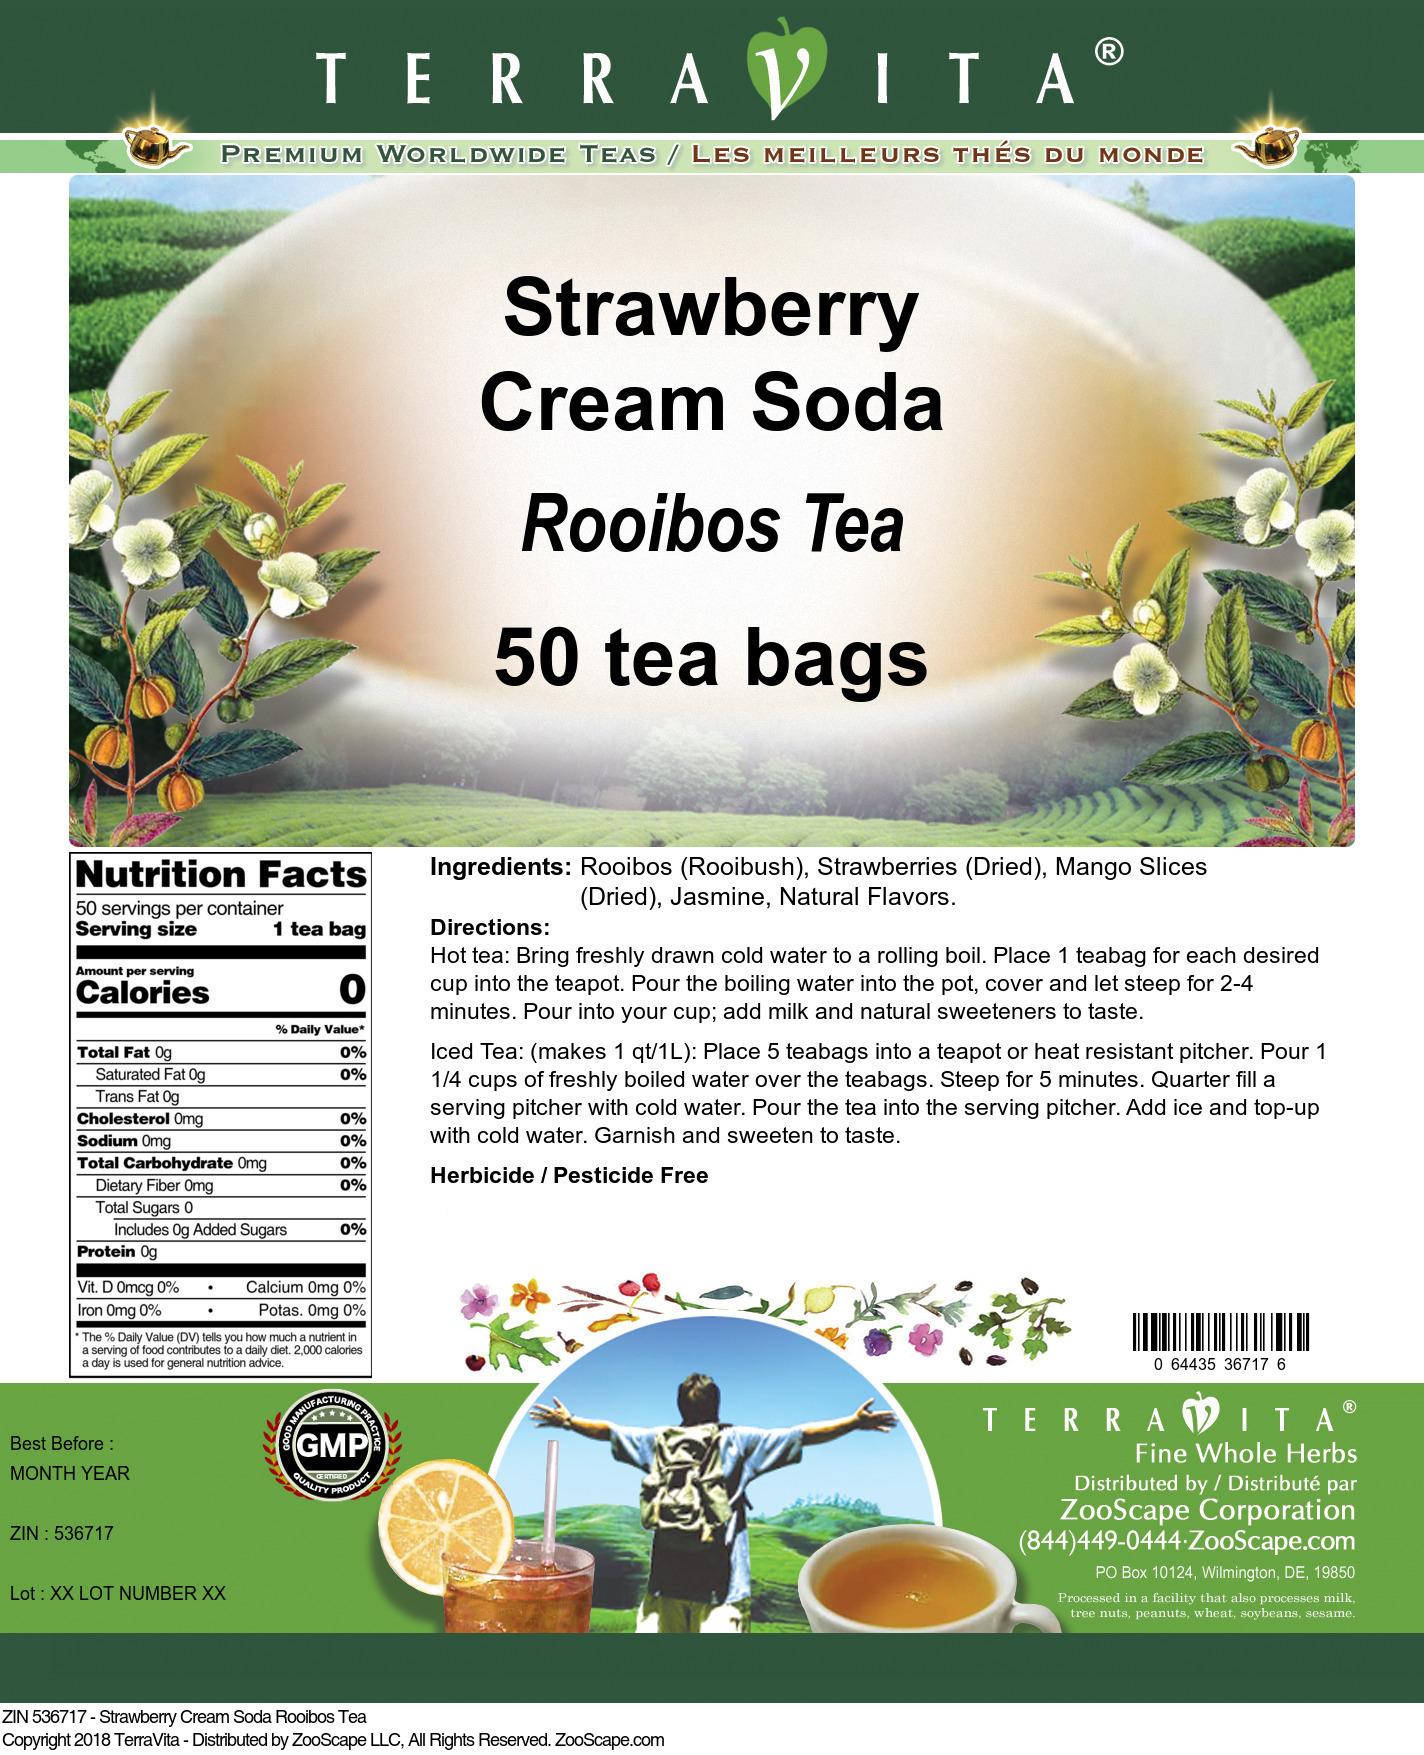 Strawberry Cream Soda Rooibos Tea